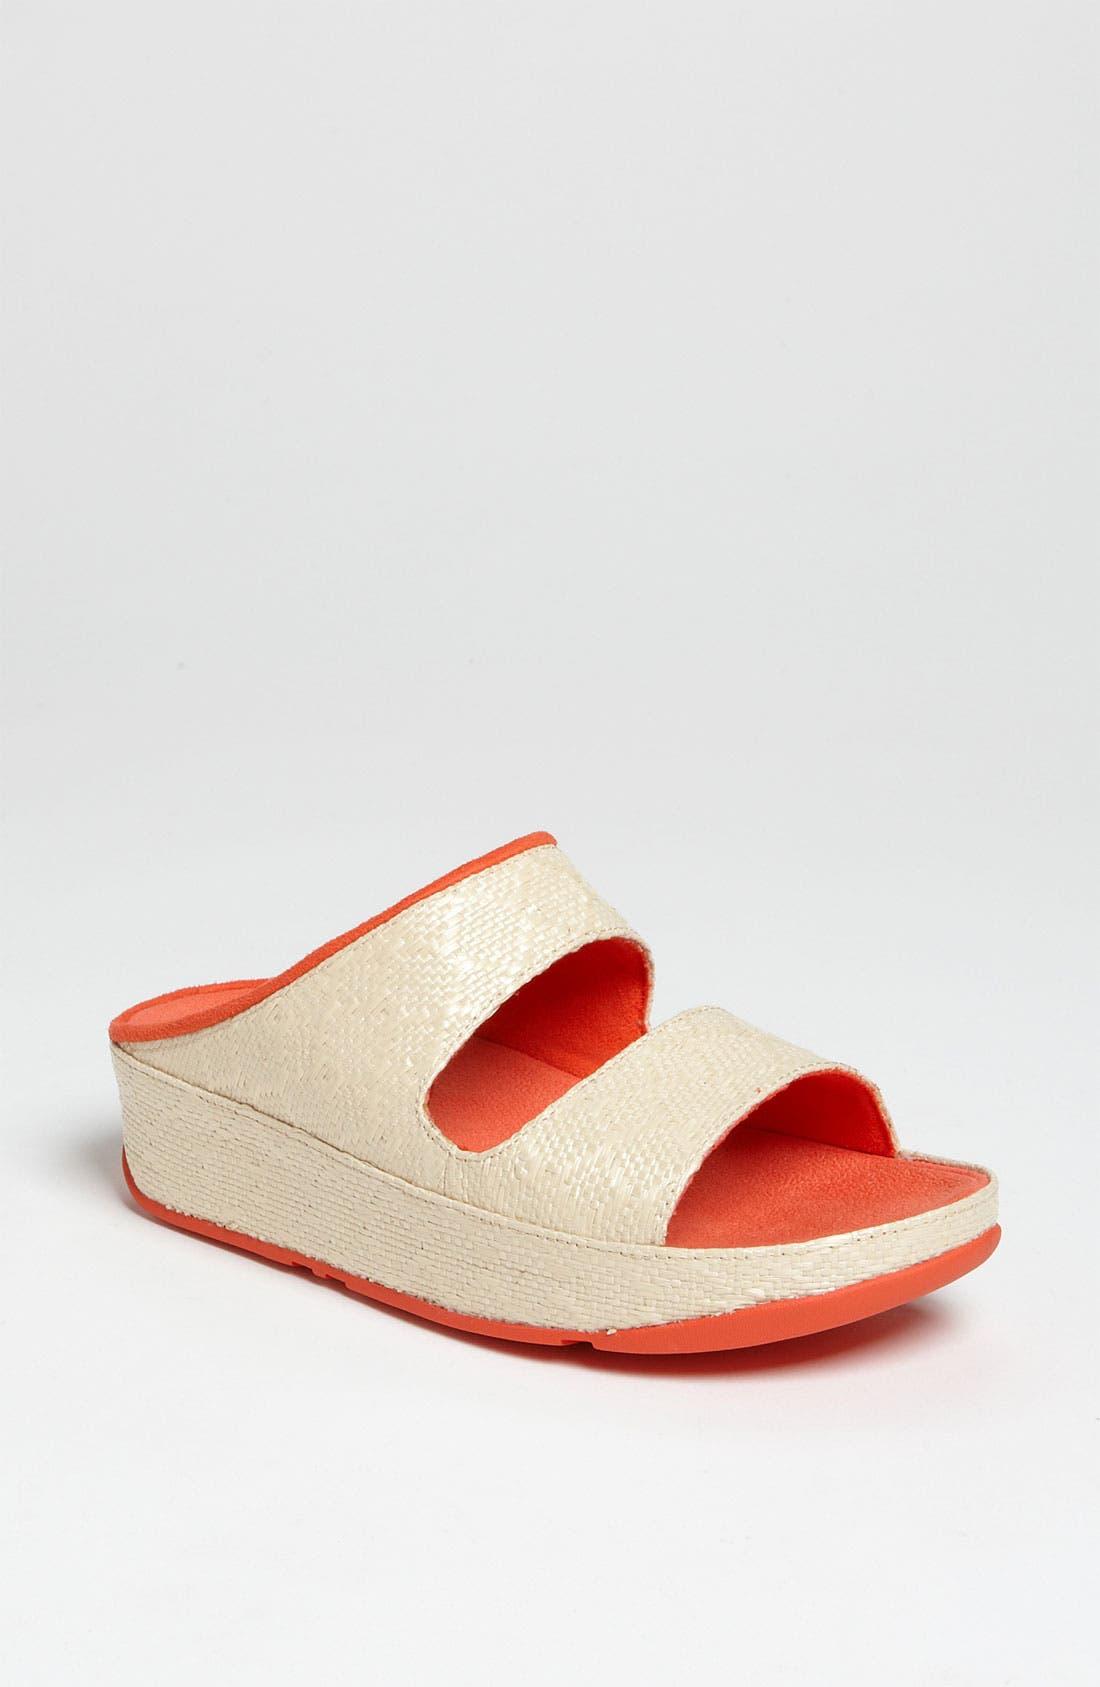 Main Image - FitFlop 'Lolla Raffia' Sandal